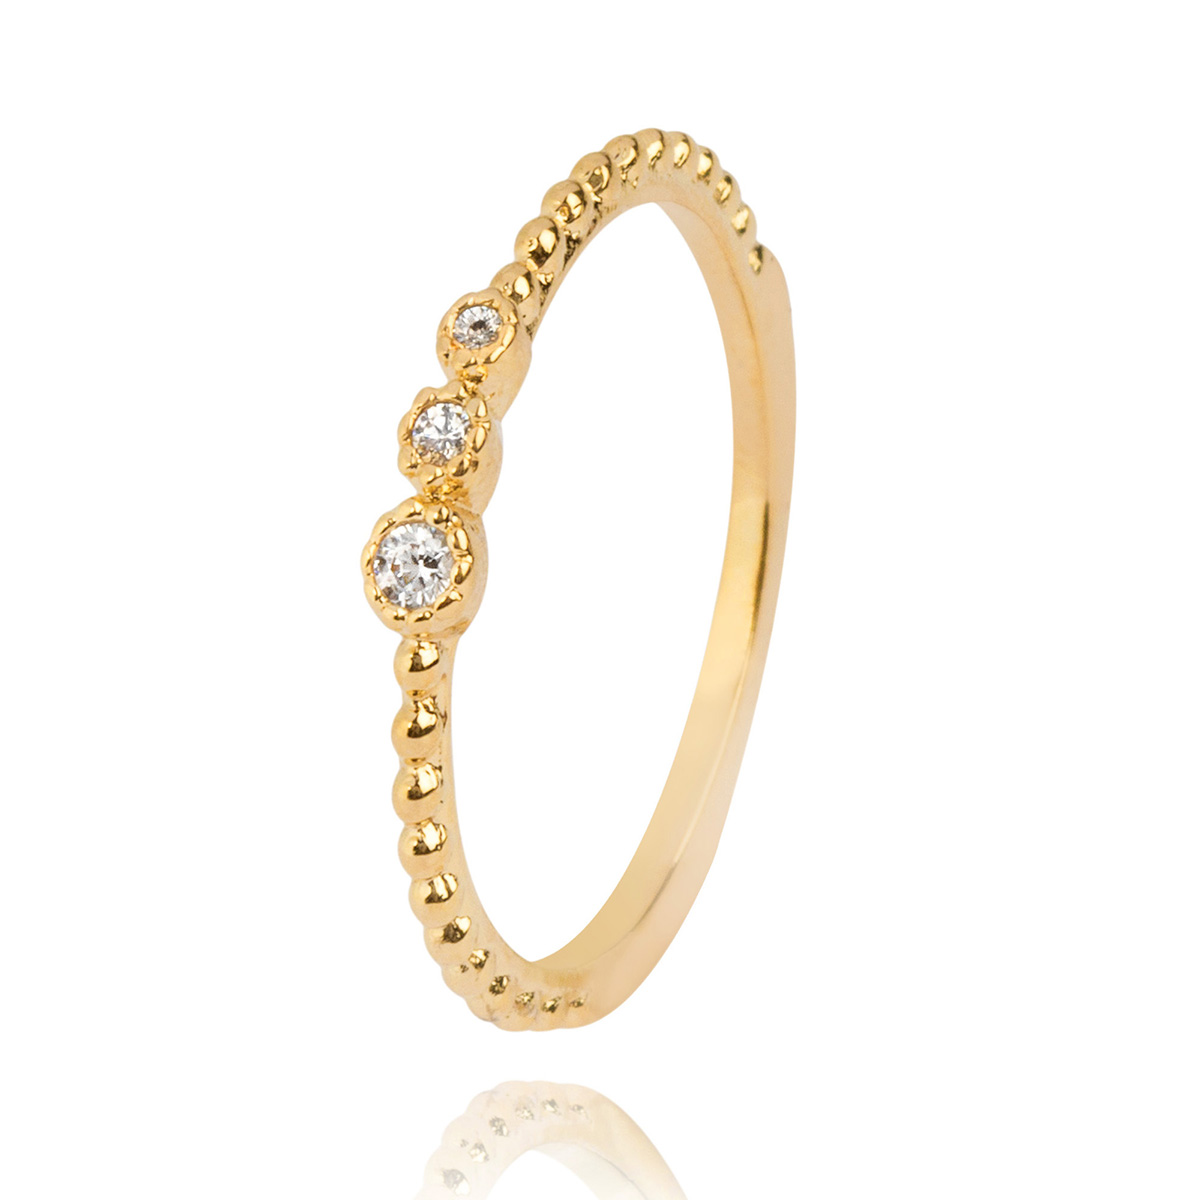 Anel Delicado com Pedra de Zircônia Branca Semijoia em Ouro 18K  - Soloyou